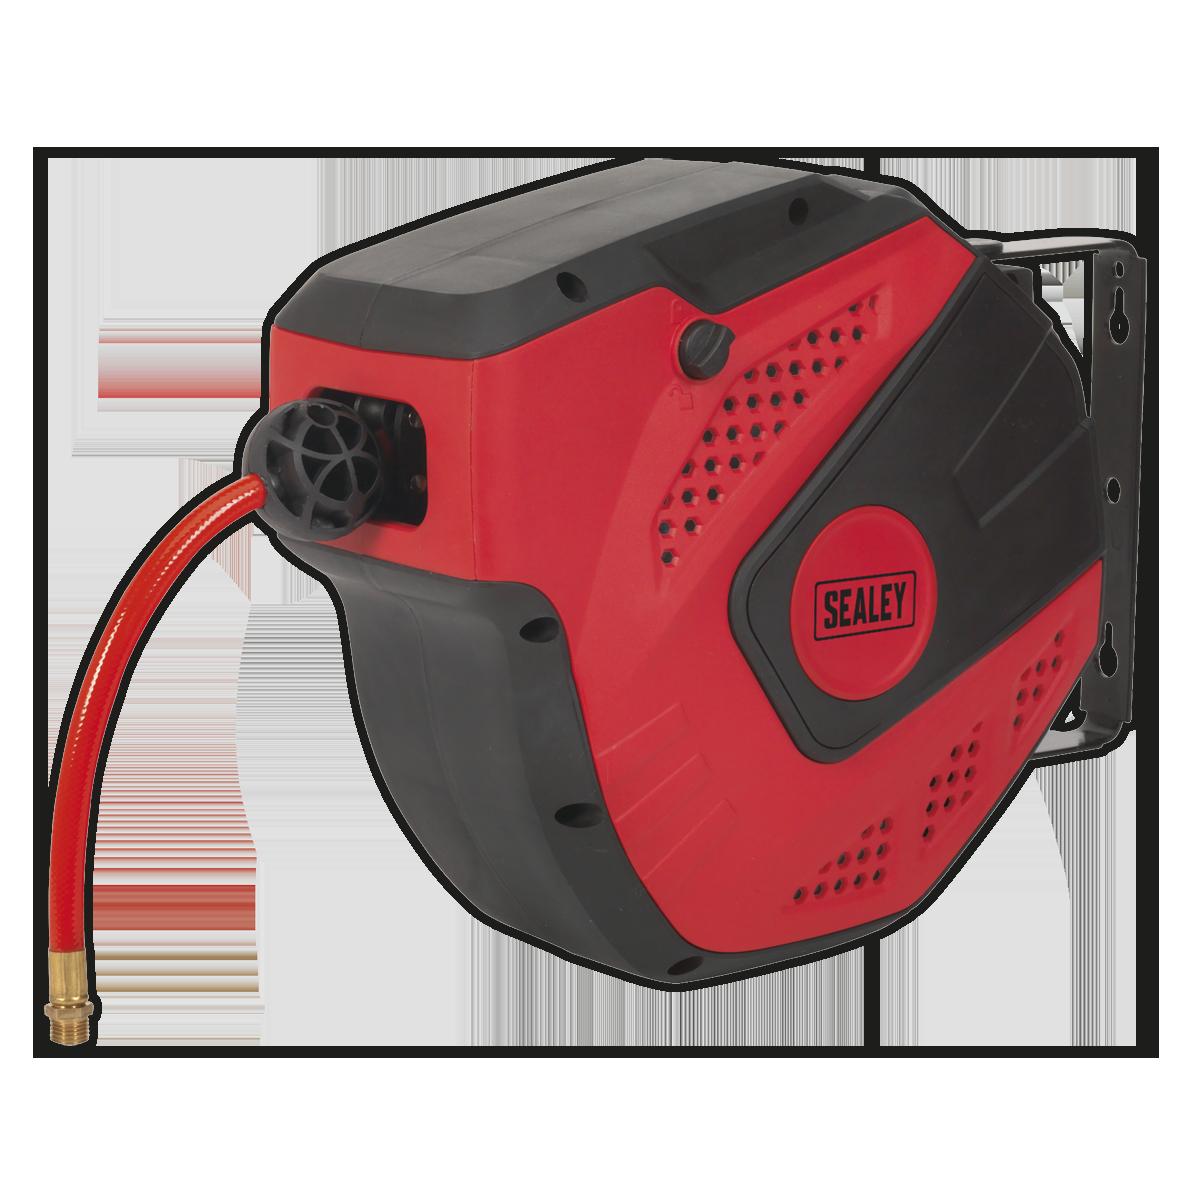 Air Hose Reel Auto-Rewind Control 10m Ø8mm ID - PU Hose